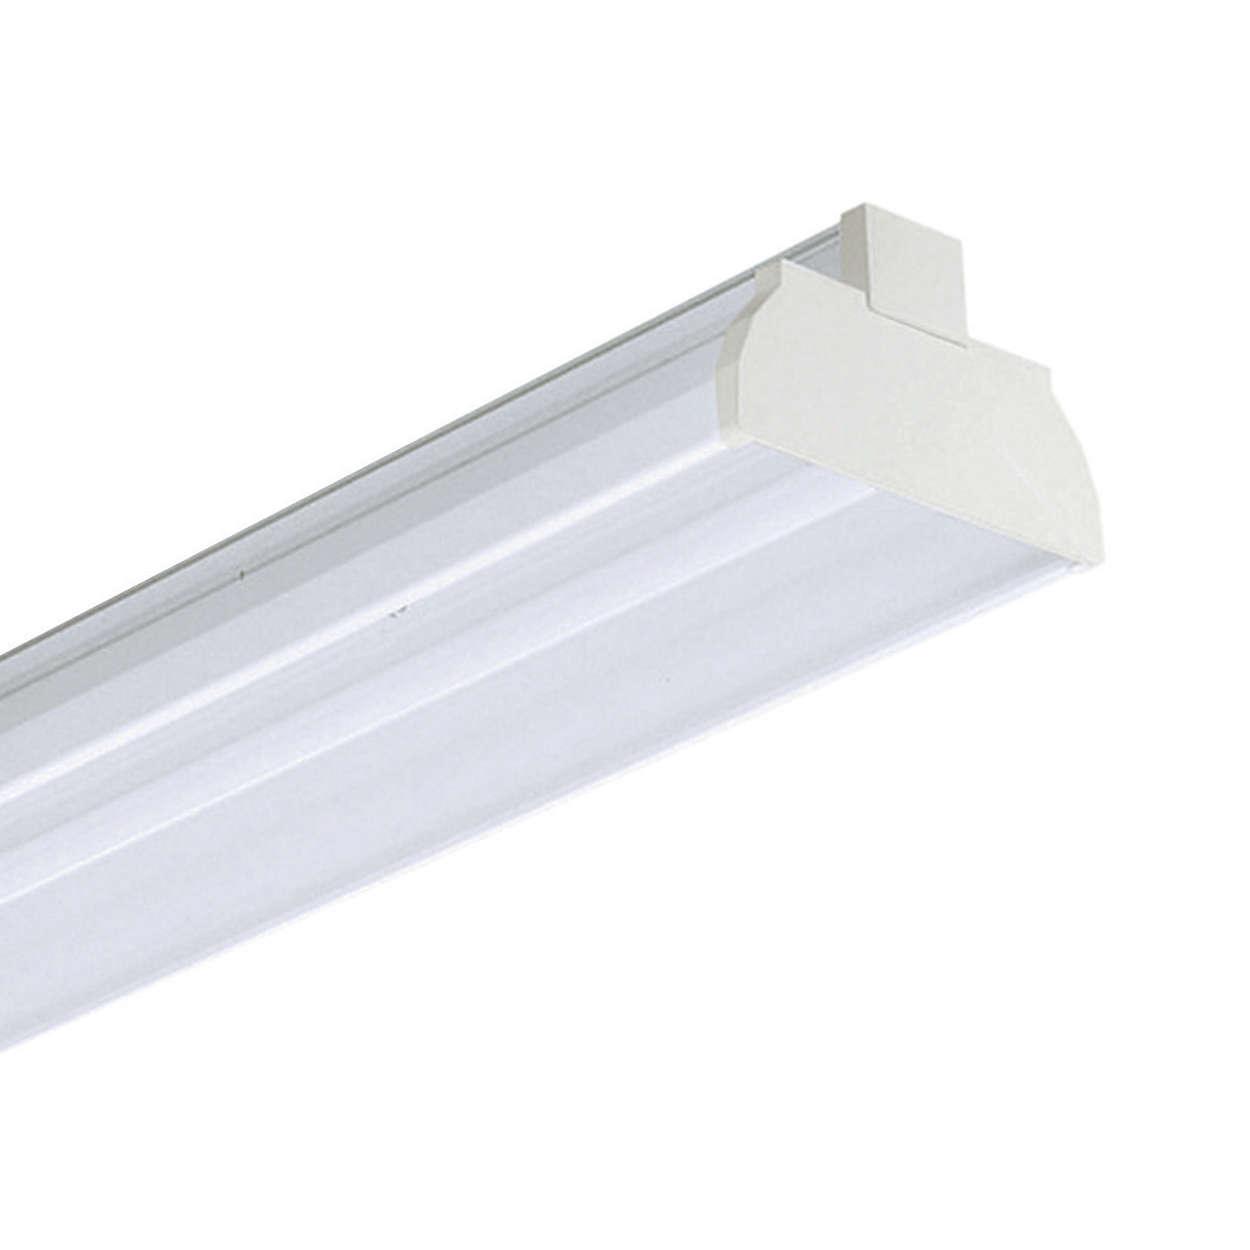 TTX400 TL-D, GMX450 multi-purpose reflectors